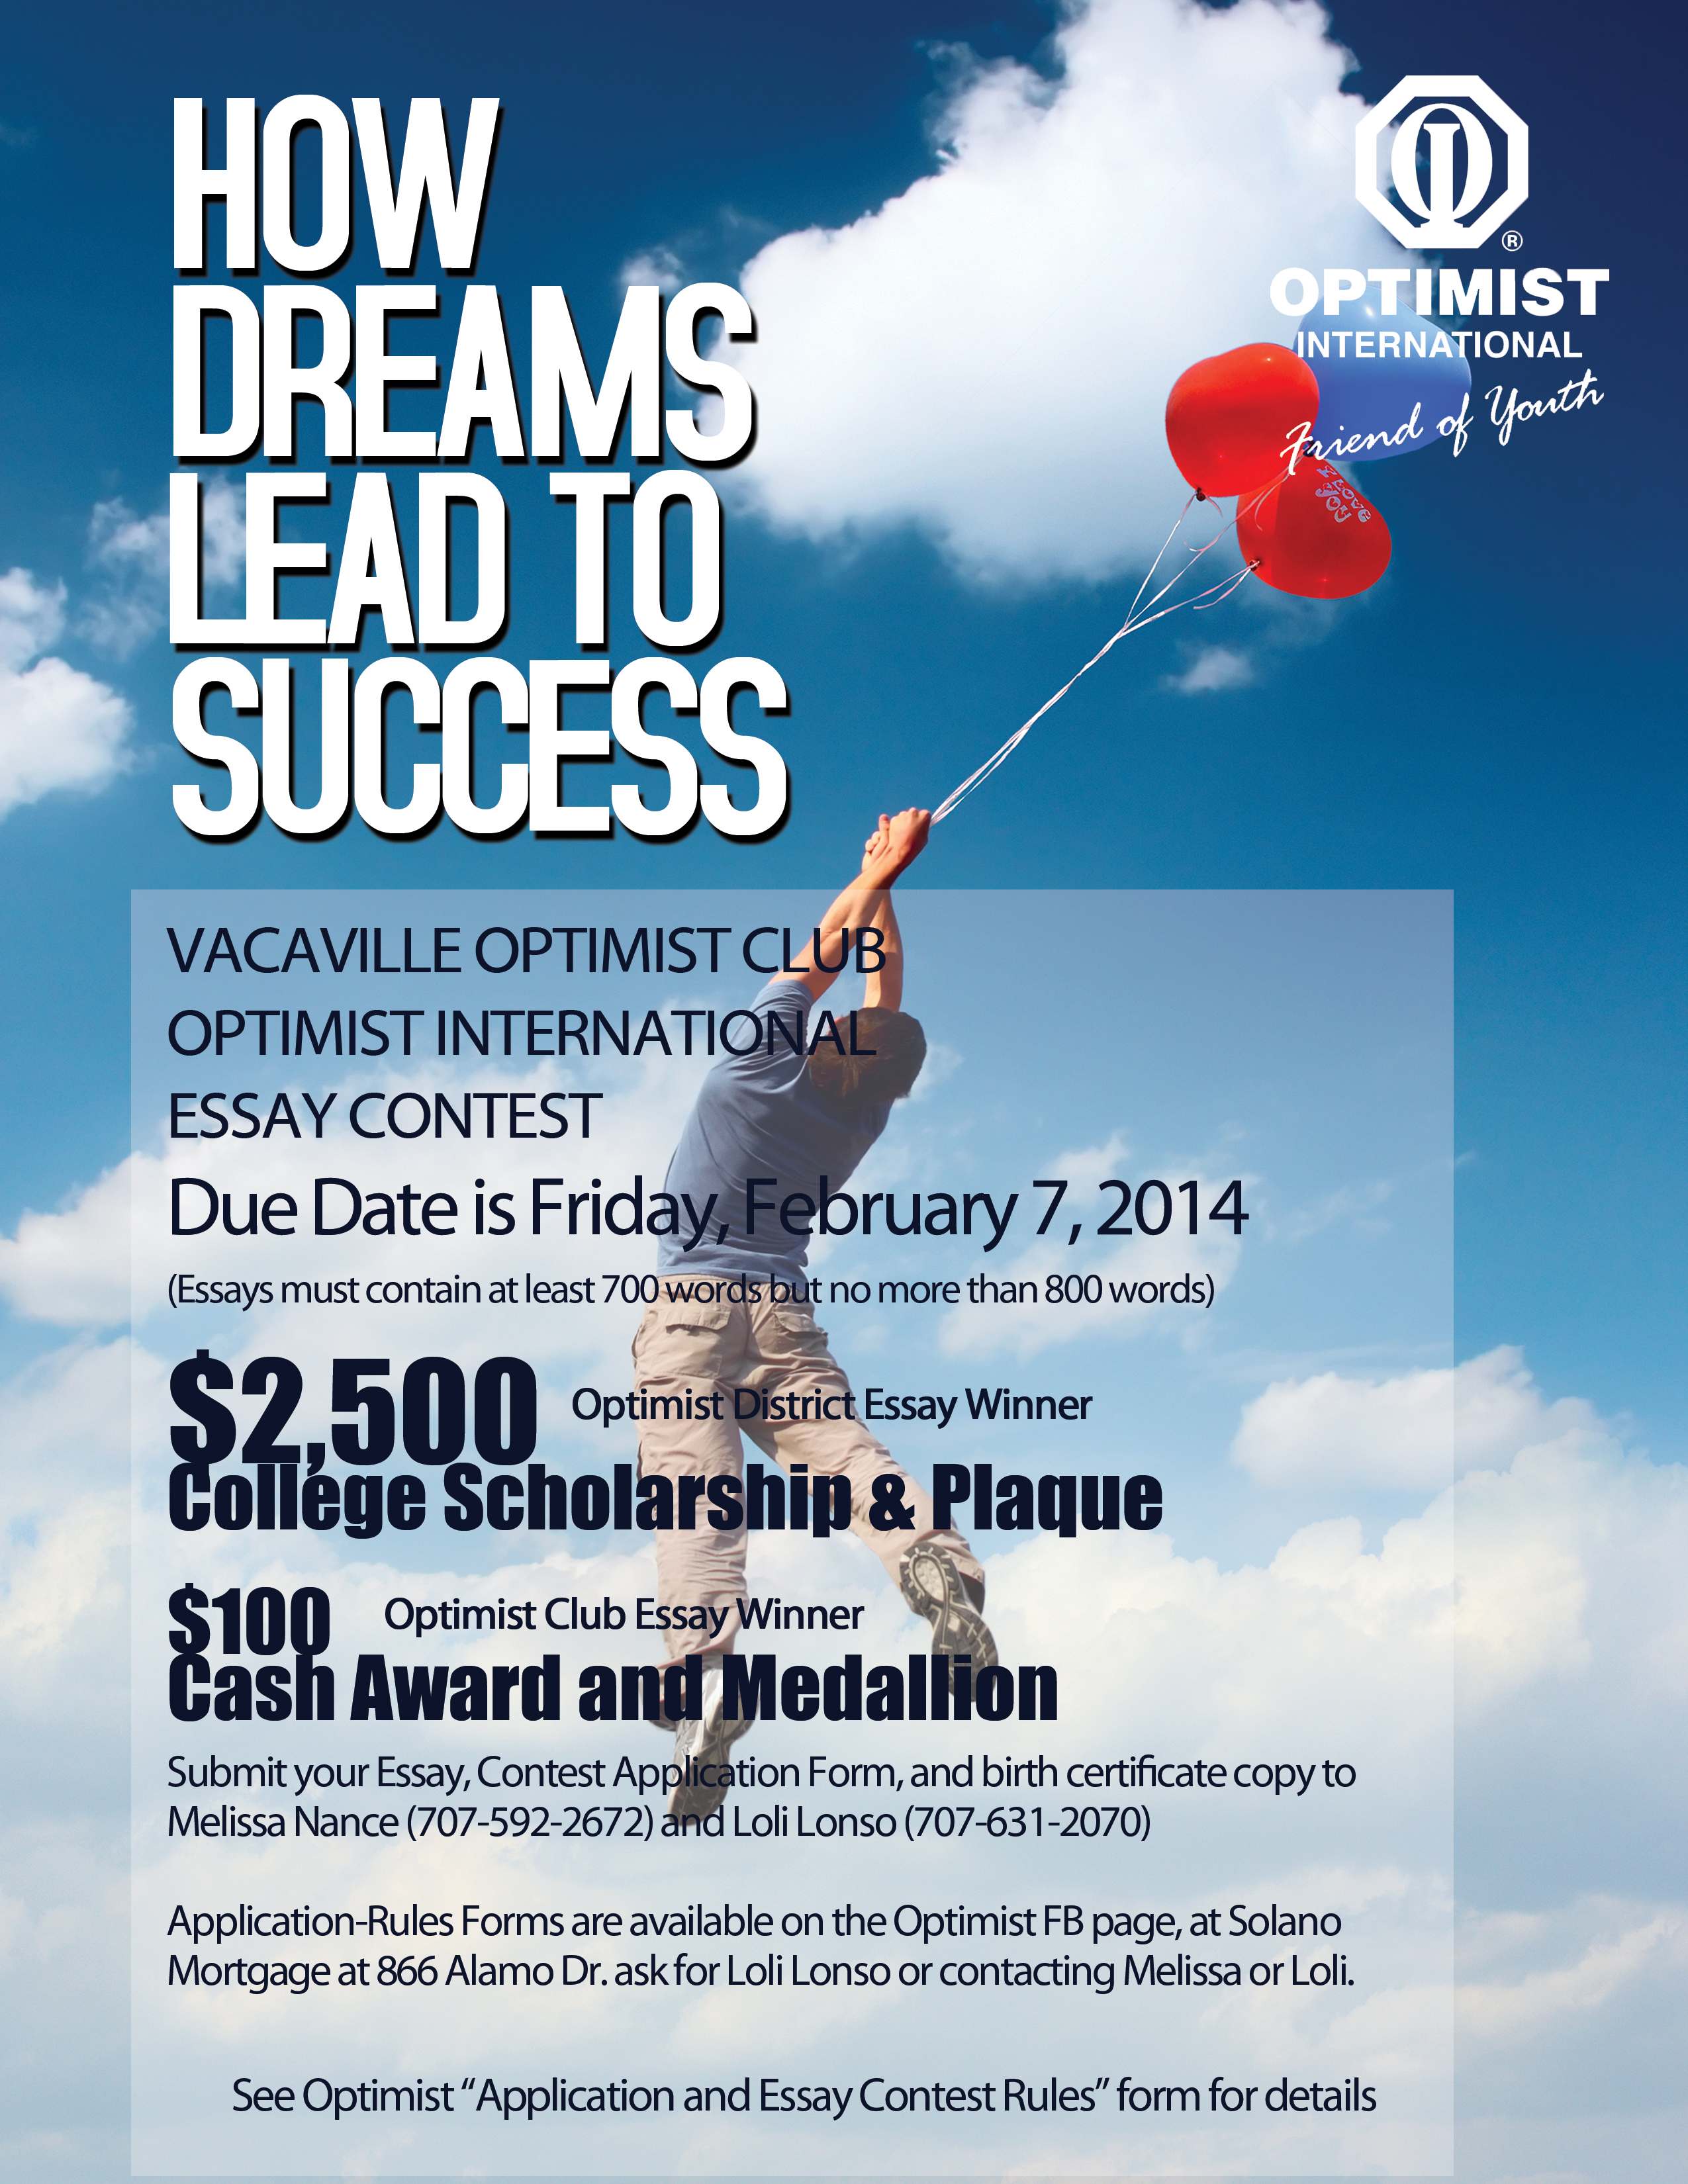 011 Postivie Outlook Essay Contest Final Example Optimist Wondrous International Winners Due Date Oratorical Full